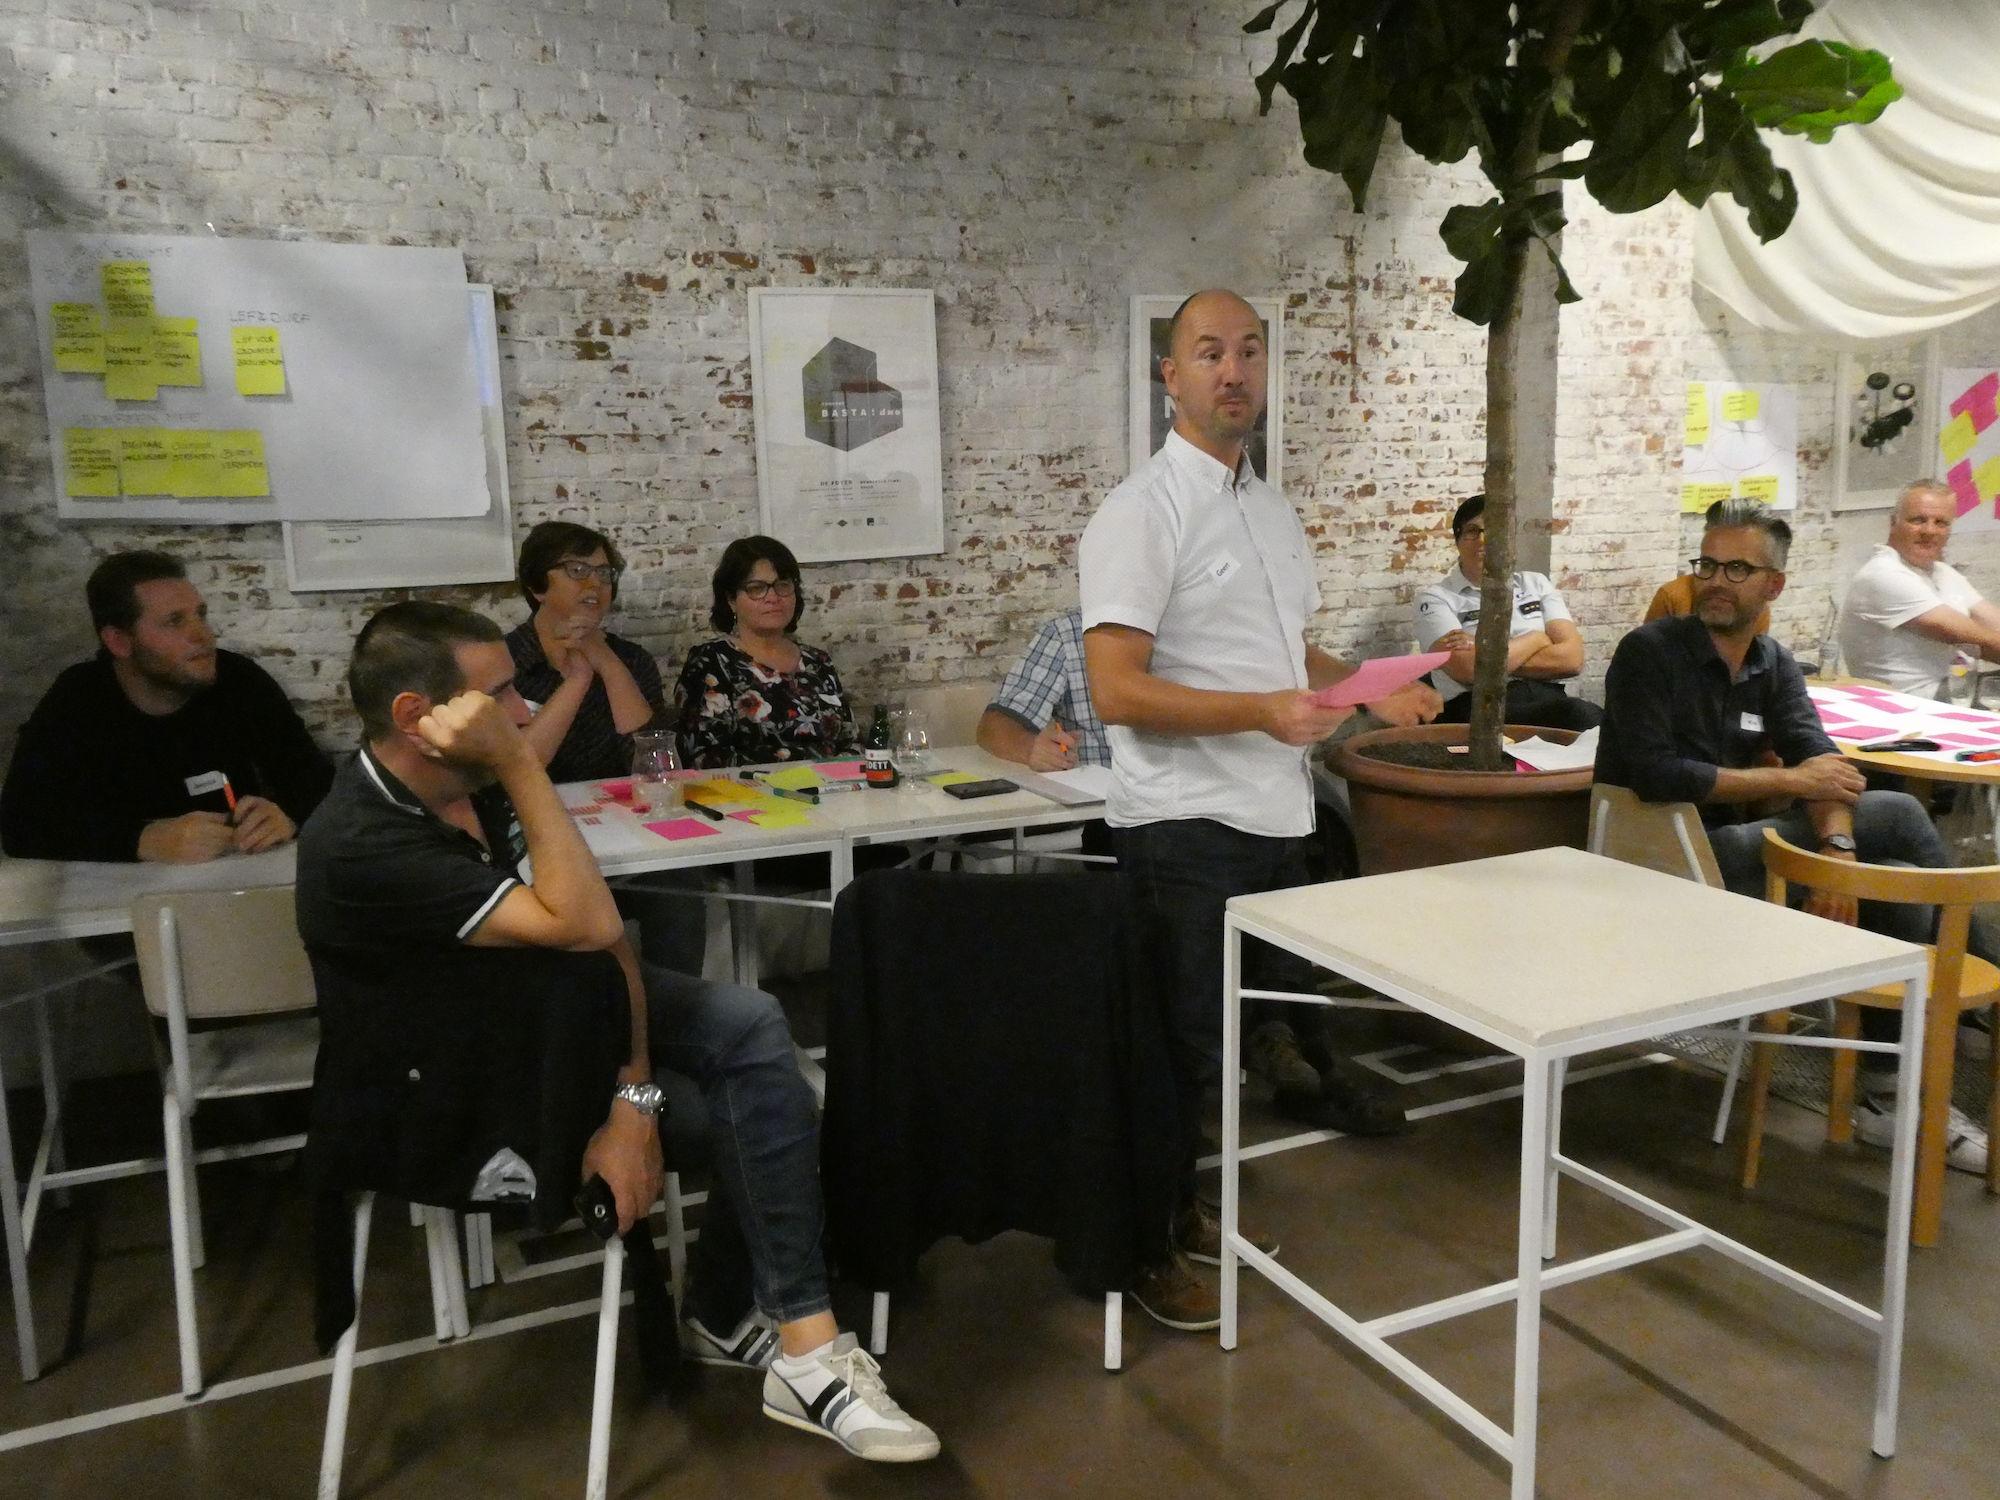 Sint-Niklaas slimme stad workshop